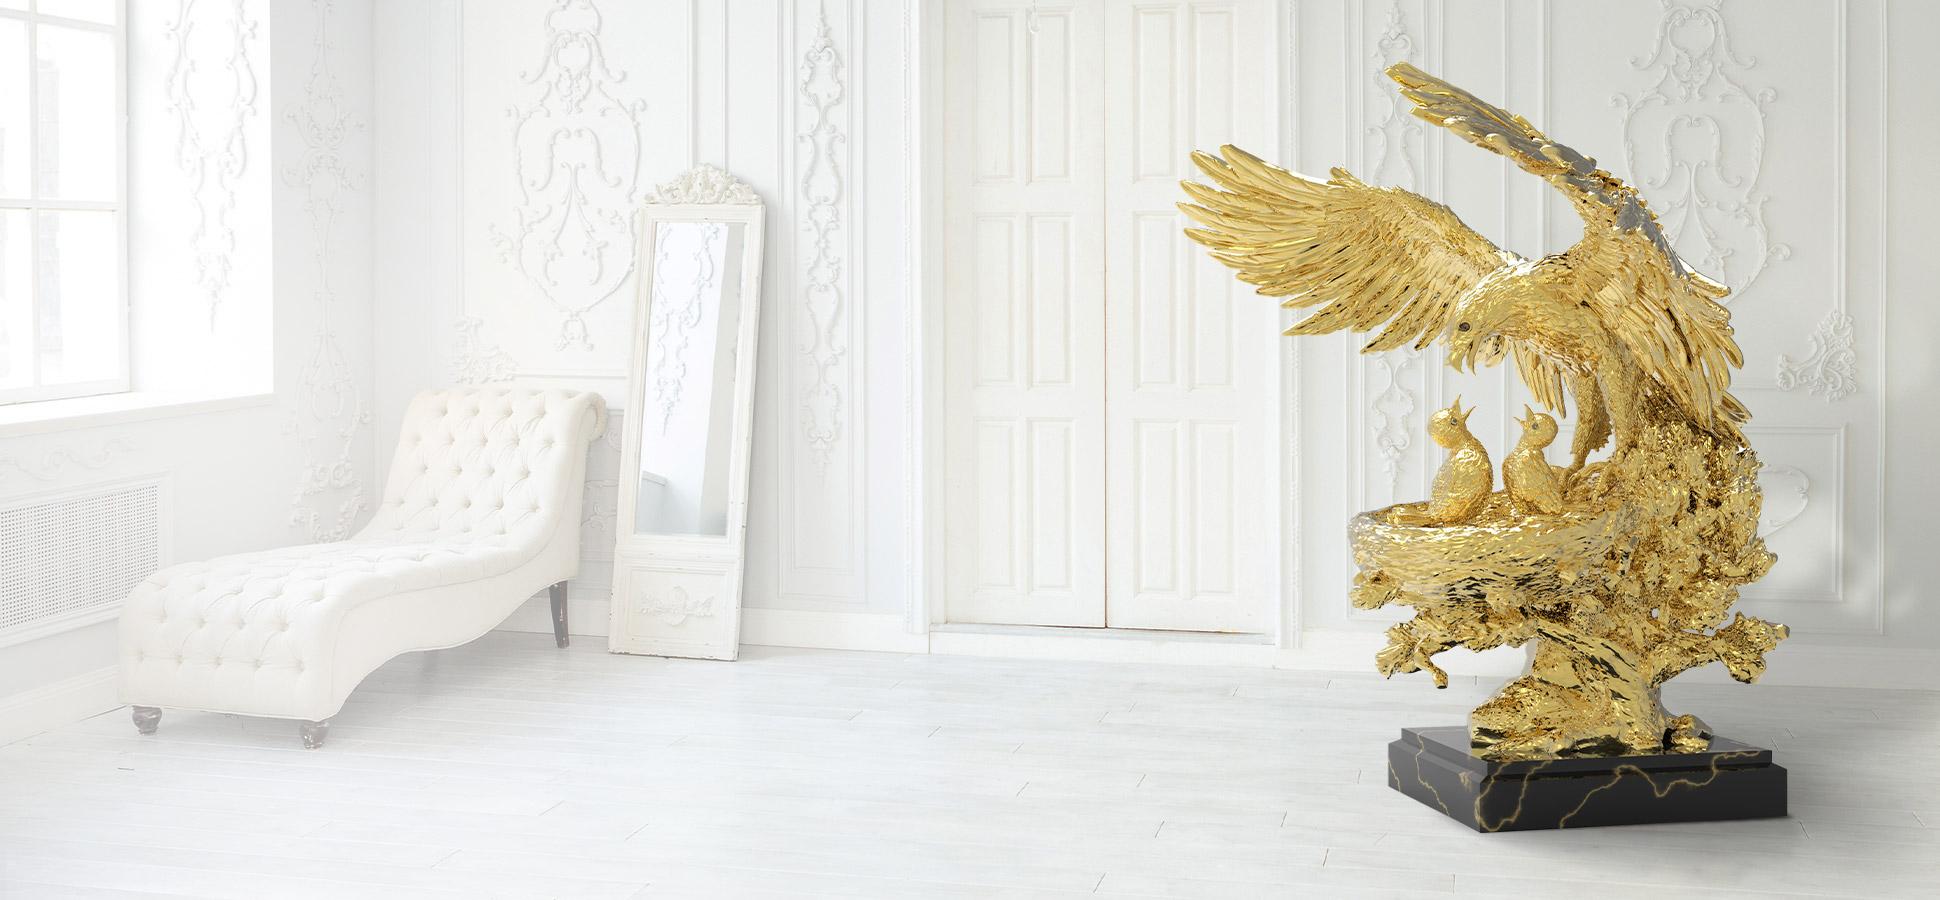 Background image 5 | natalis-luxus.com